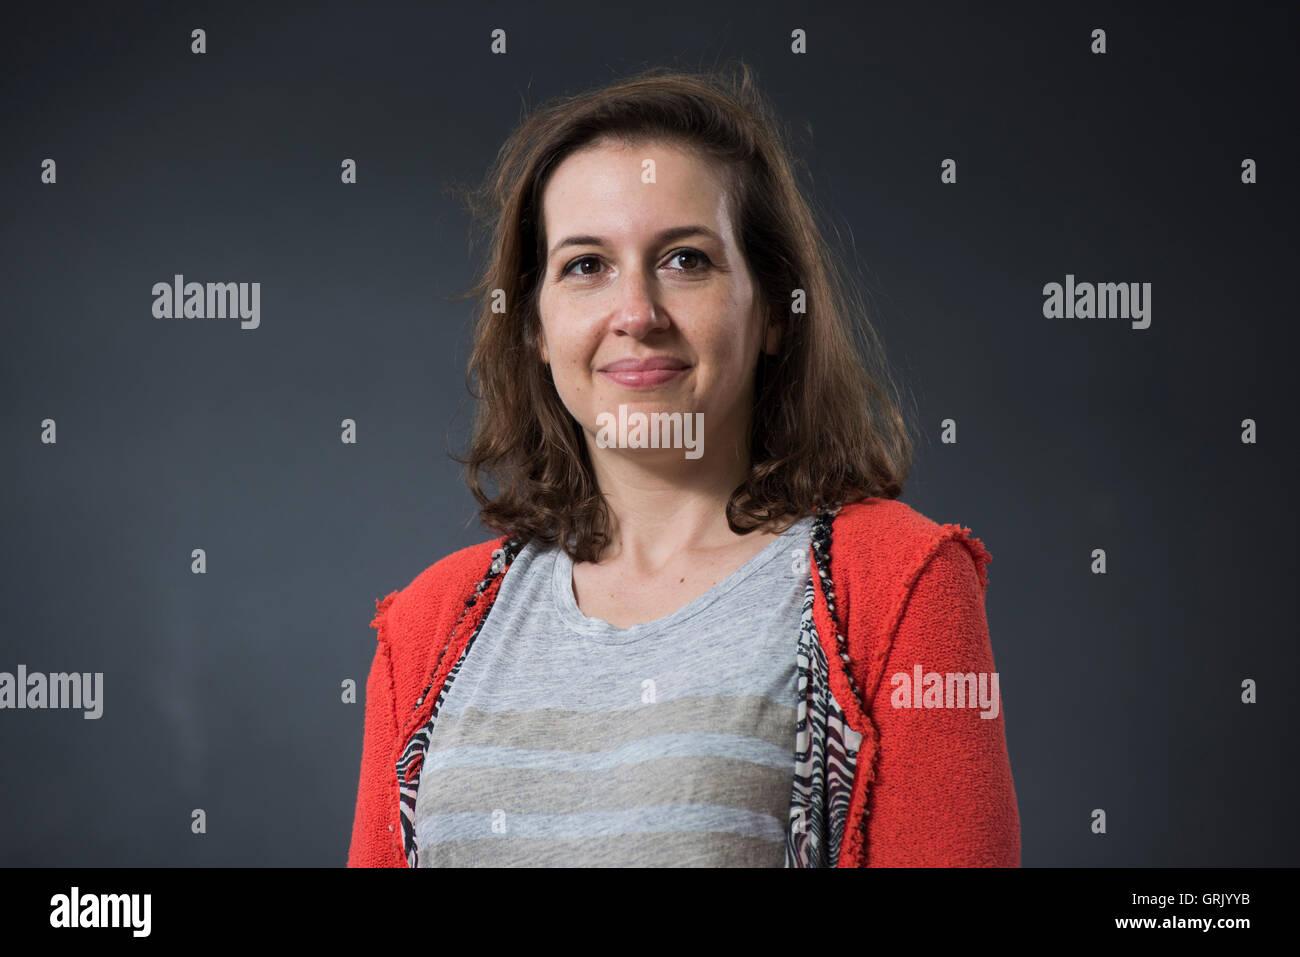 American journalist Hadley Freeman. - Stock Image